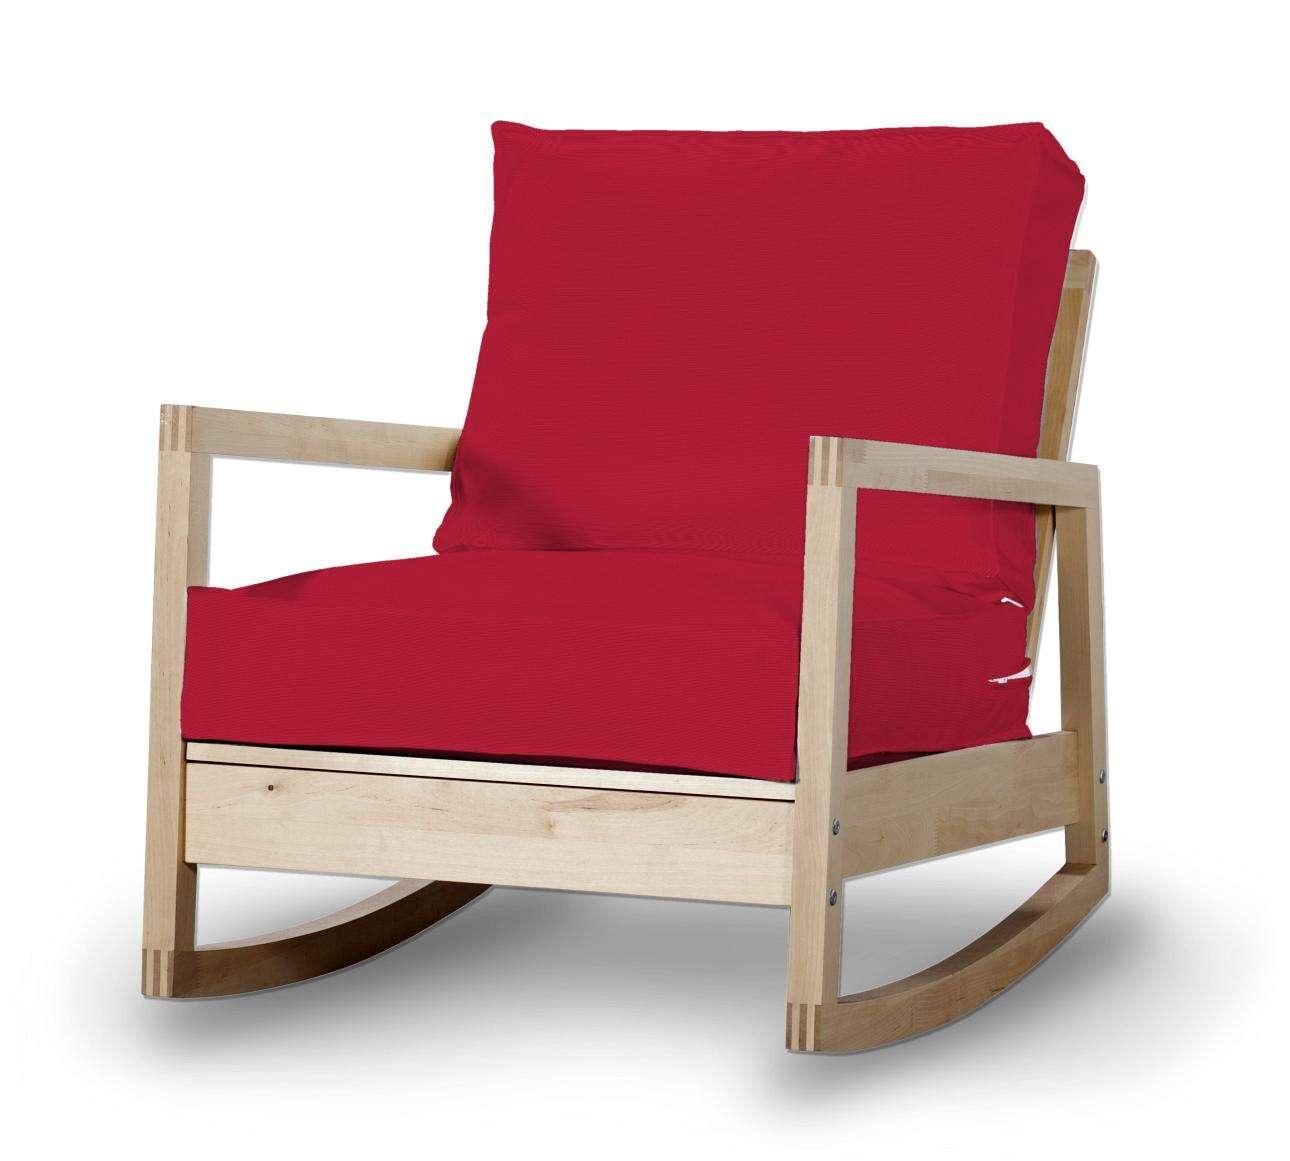 Pokrowiec na fotel Lillberg Fotel Lillberg w kolekcji Cotton Panama, tkanina: 702-04